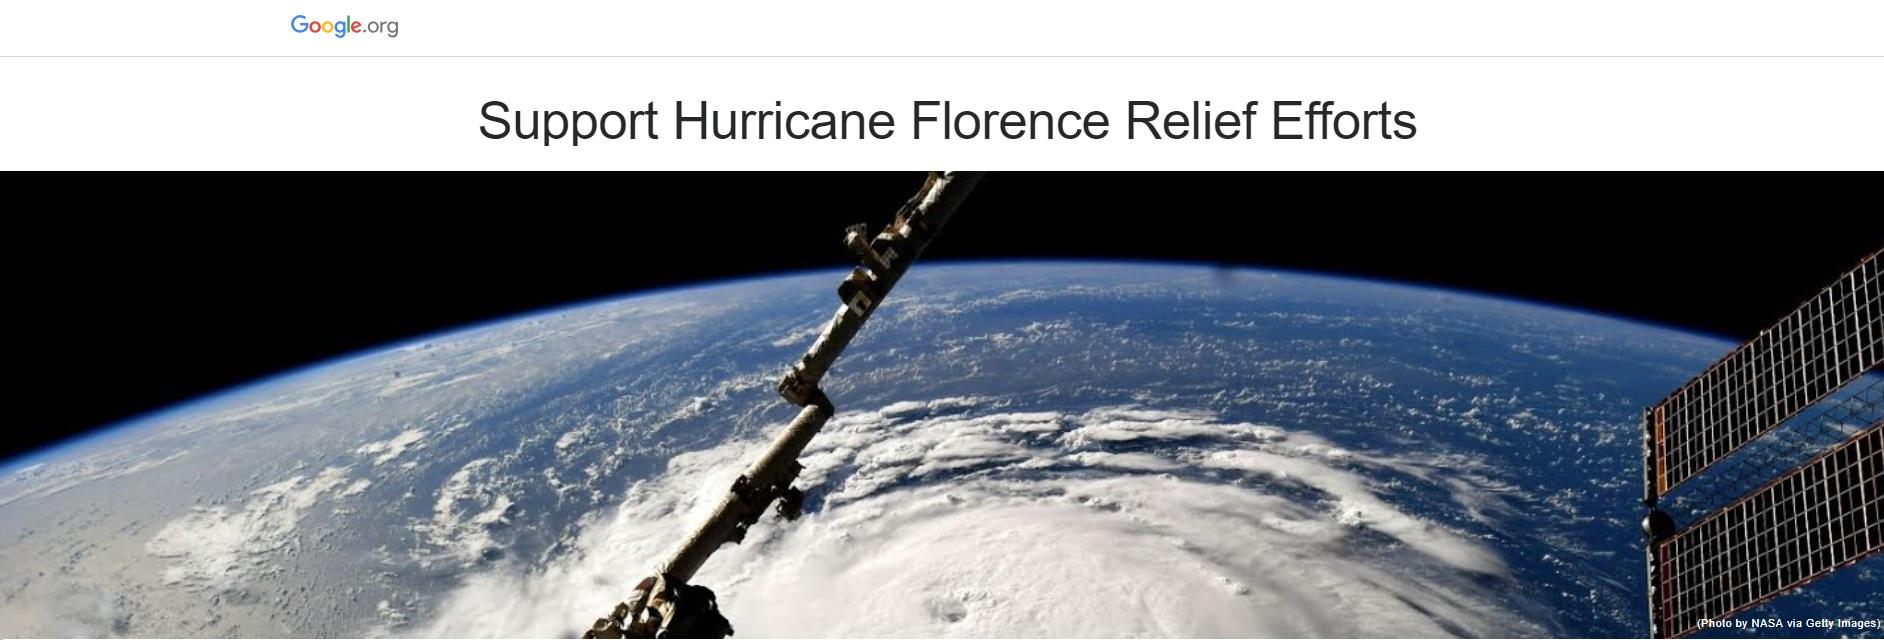 Hurricane Florance 2018